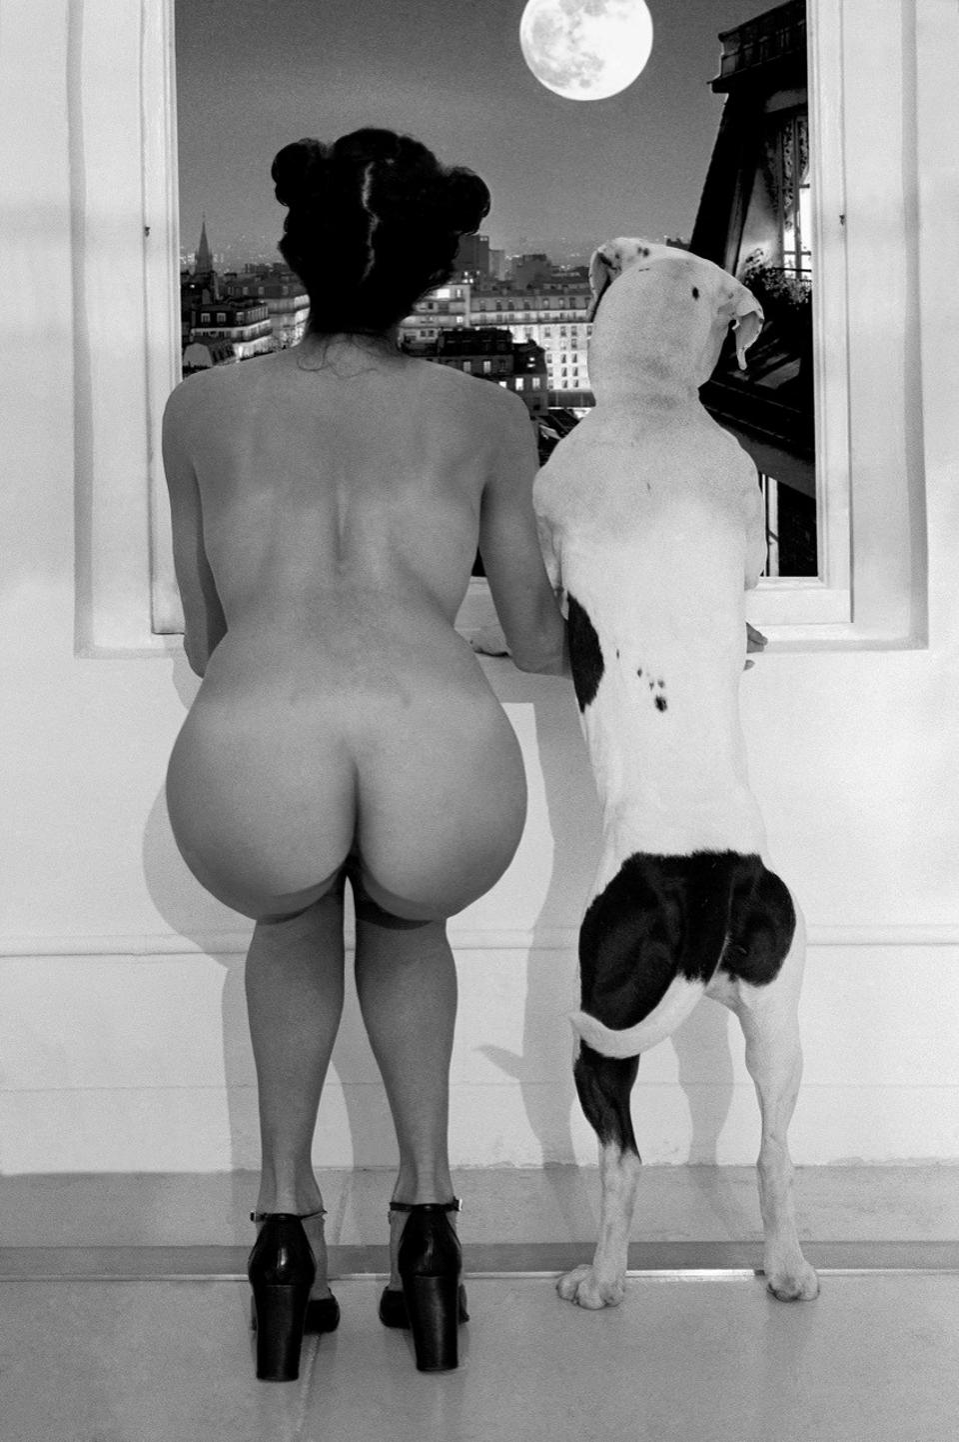 ″Guy Le Baube: Behind The Scenes″ on display Avant Gallery at Hudson Yards